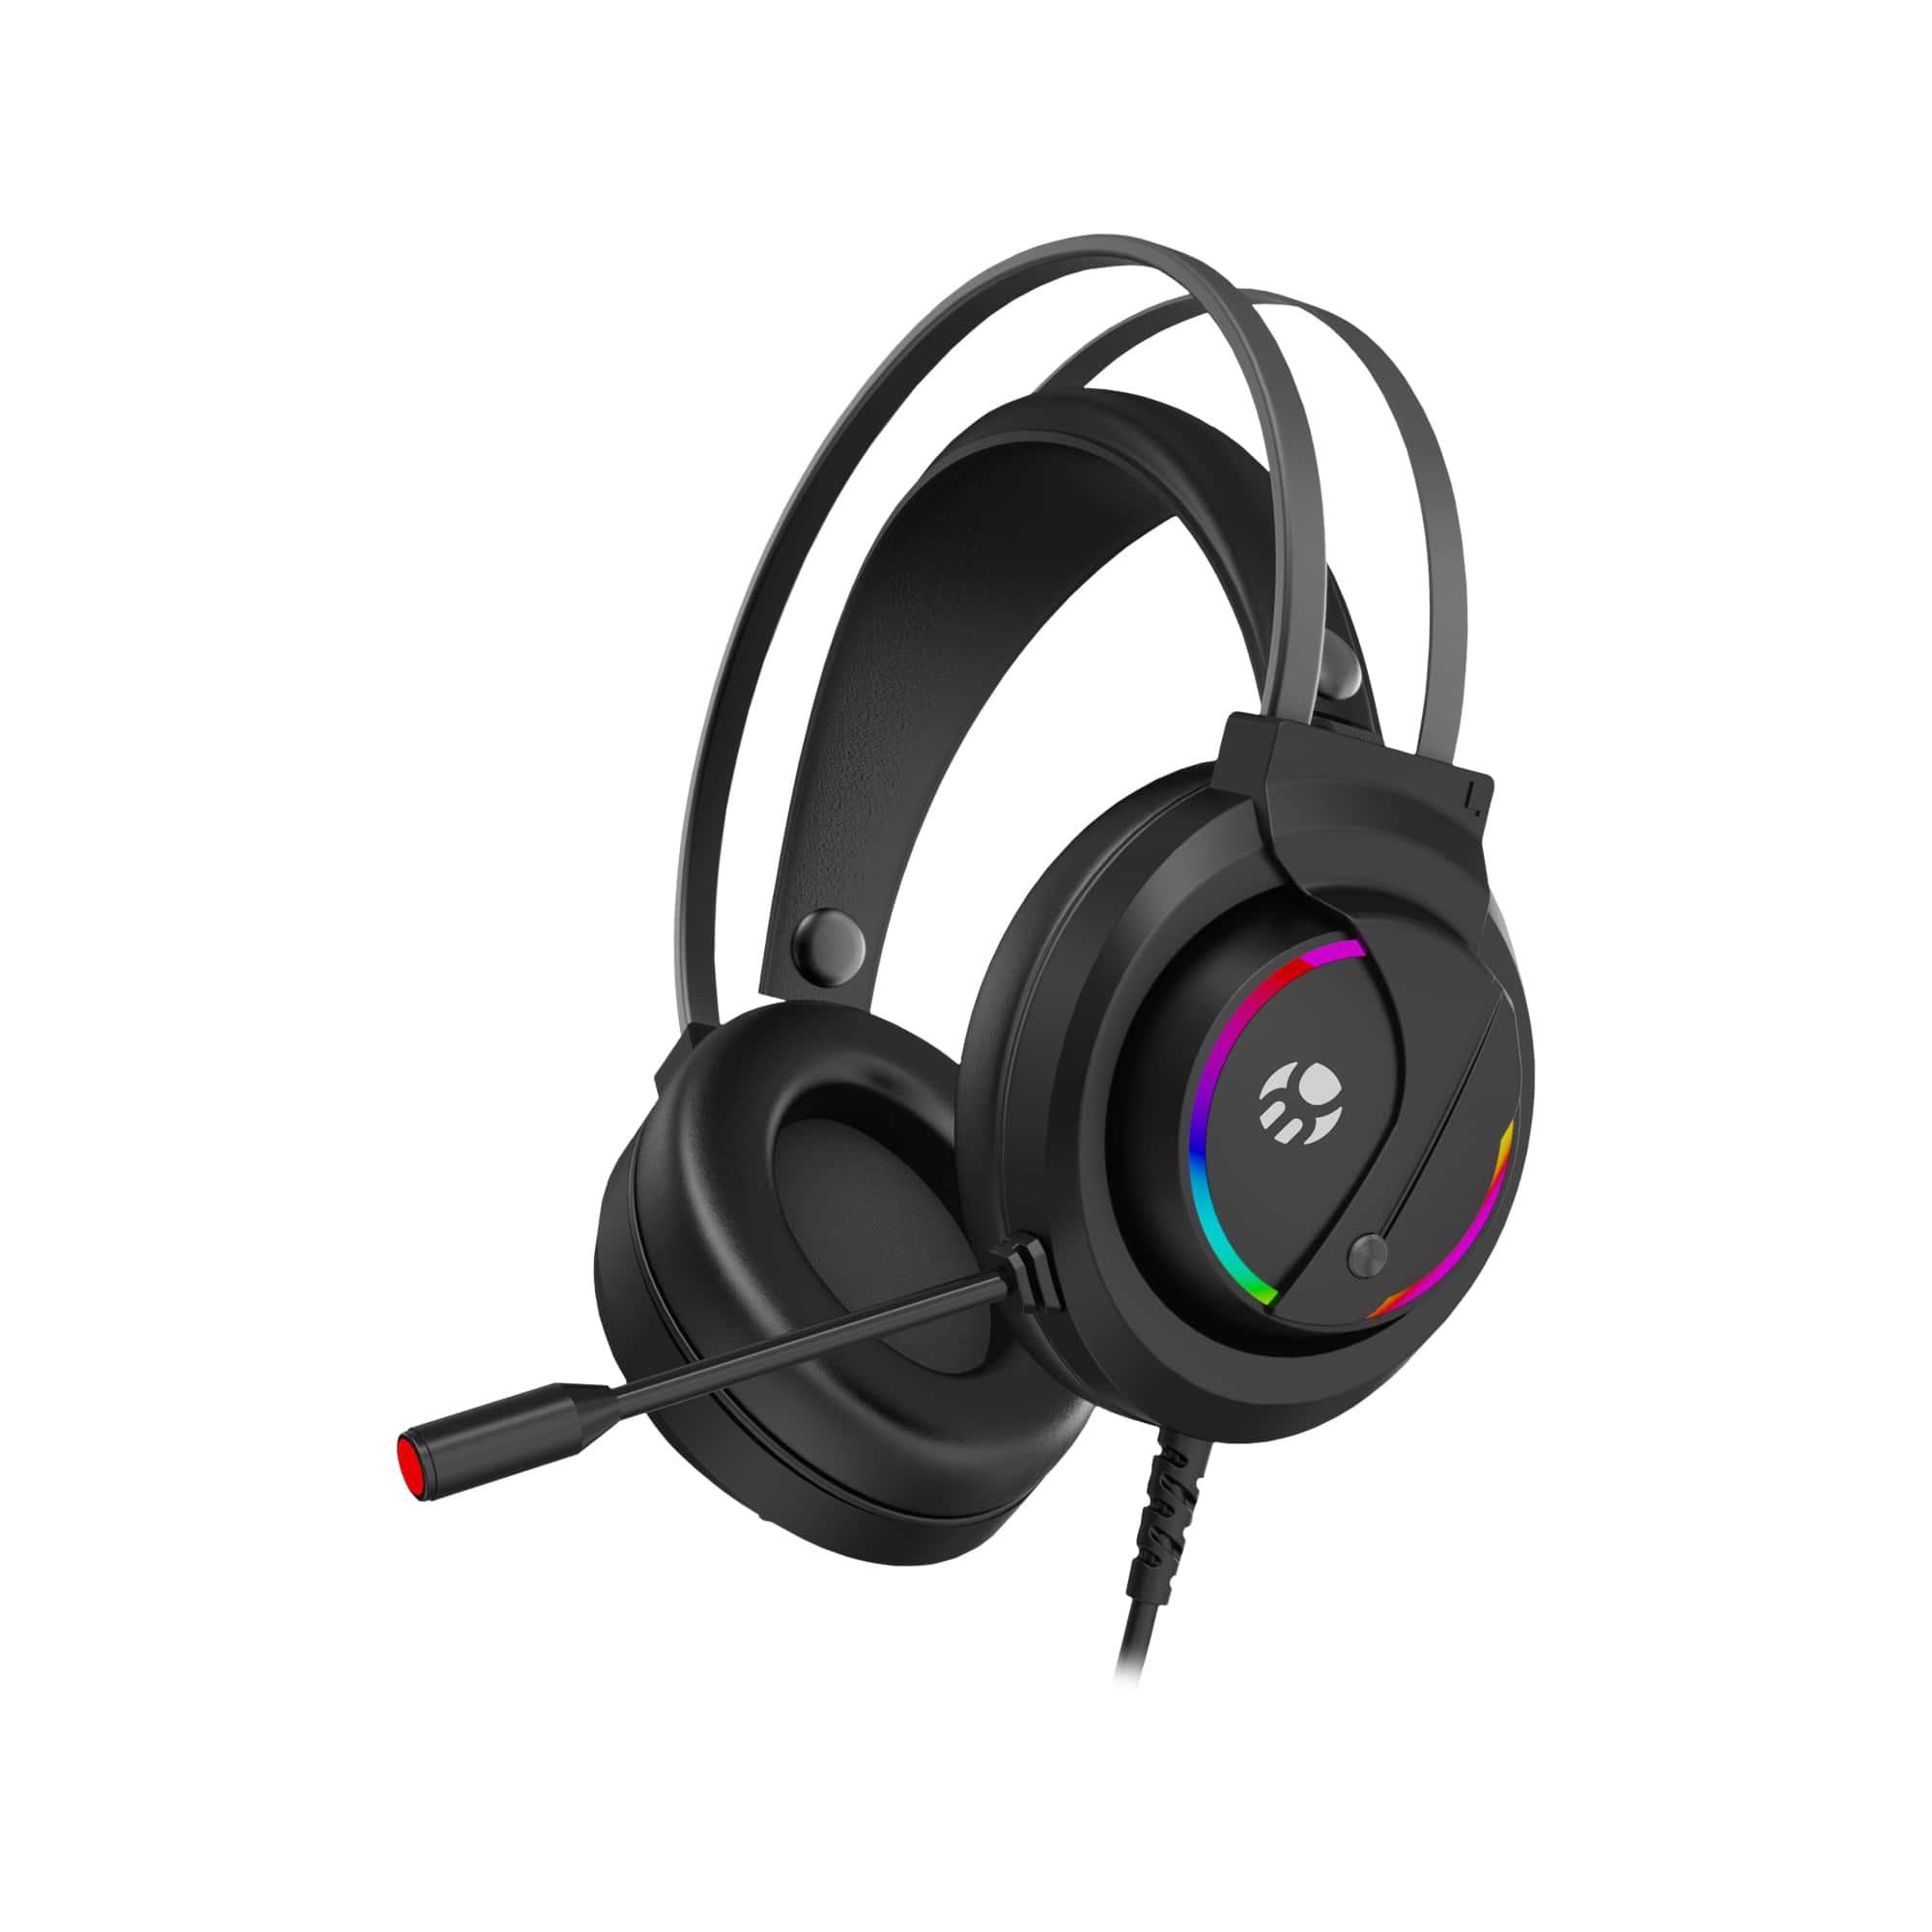 Headset Gamer Bluecase, Led 7 Cores, P2 / USB, c/ Adaptador para PS4 - BHG-501